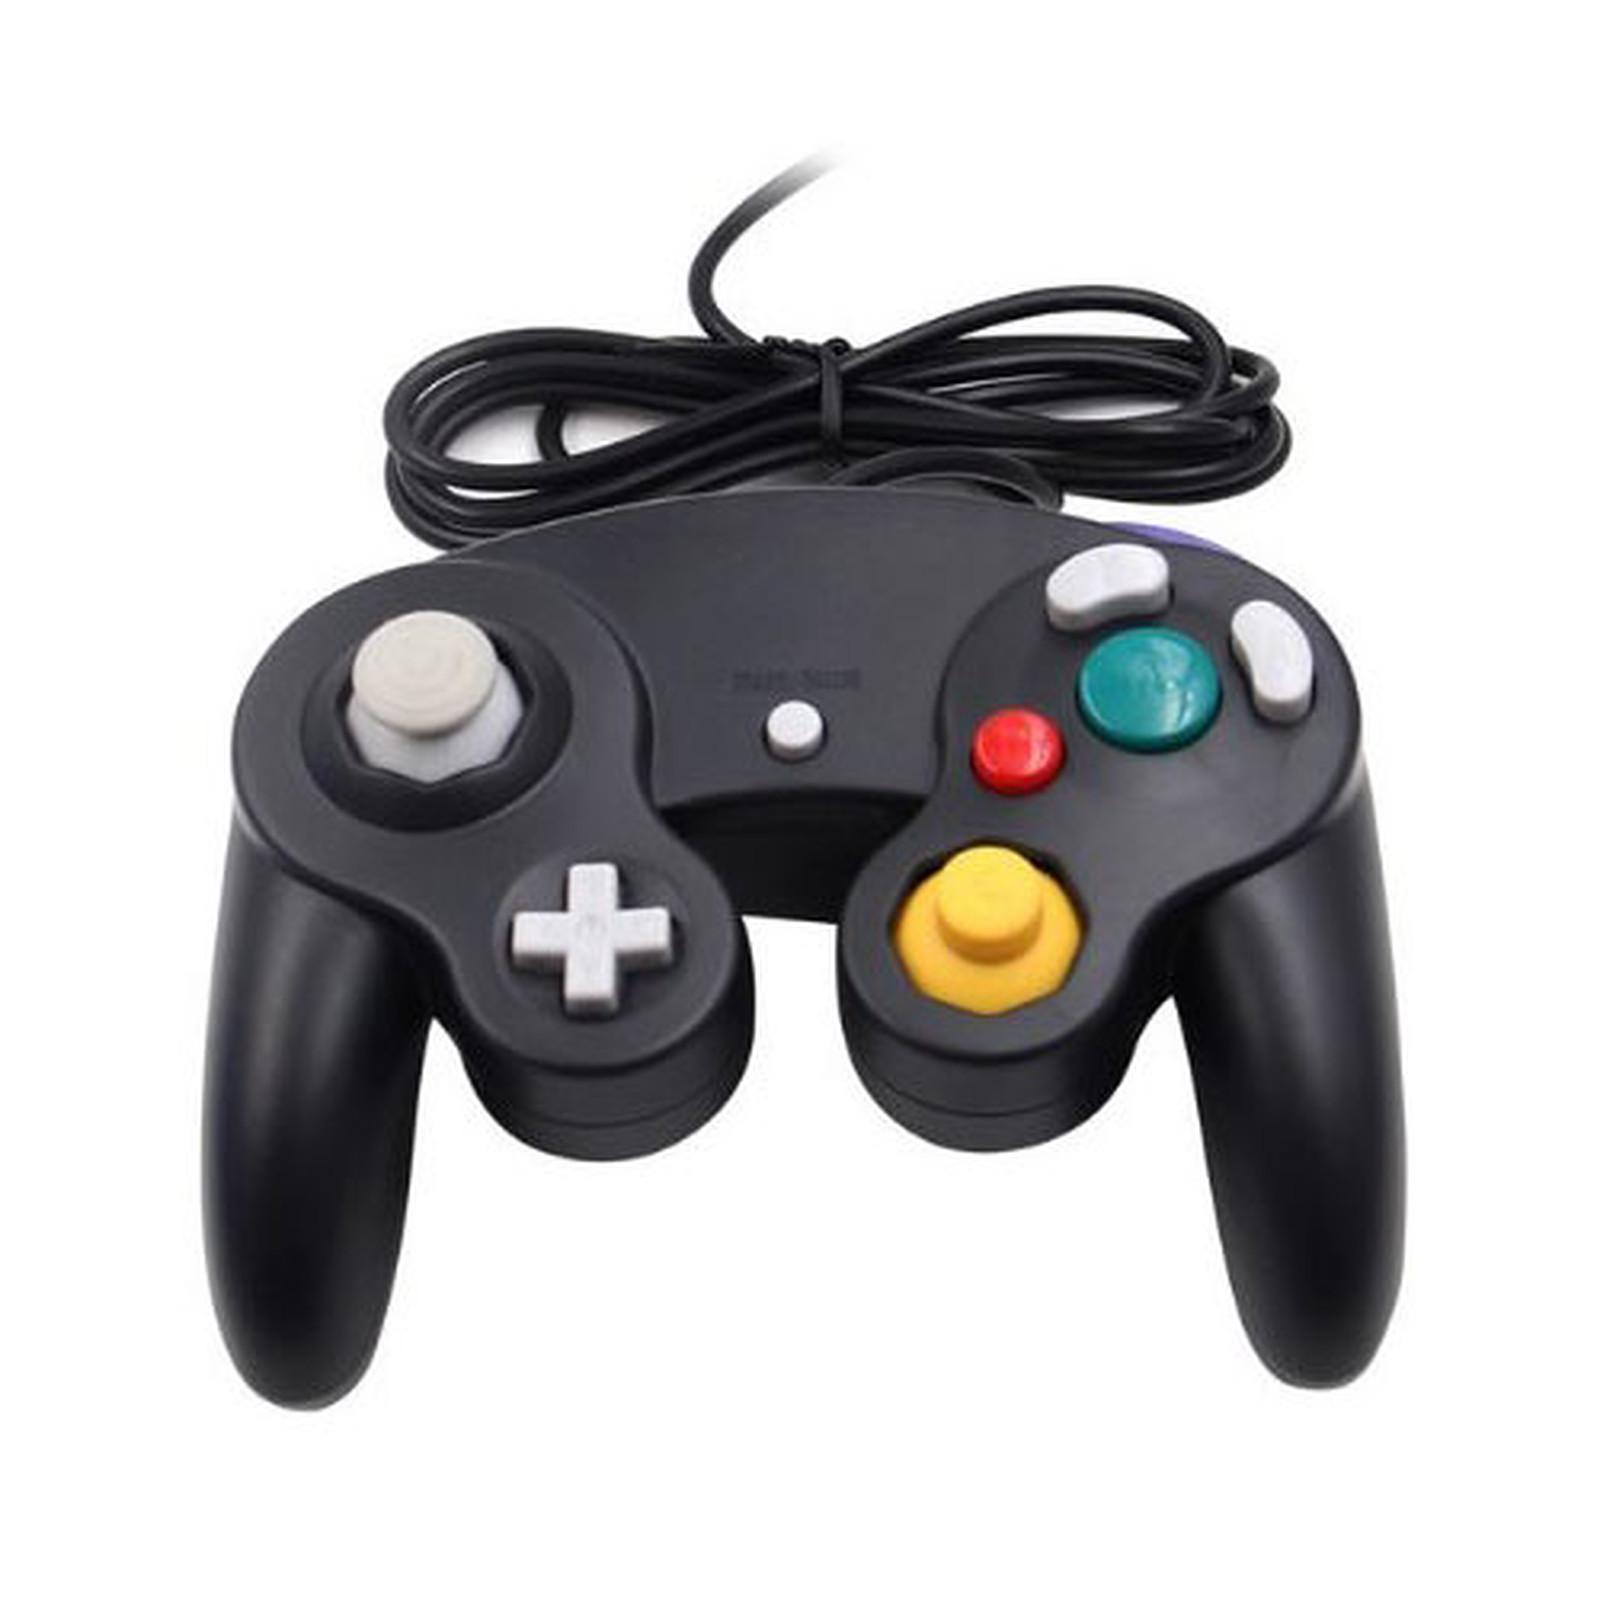 Mando USB para rétrogaming (GameCube)